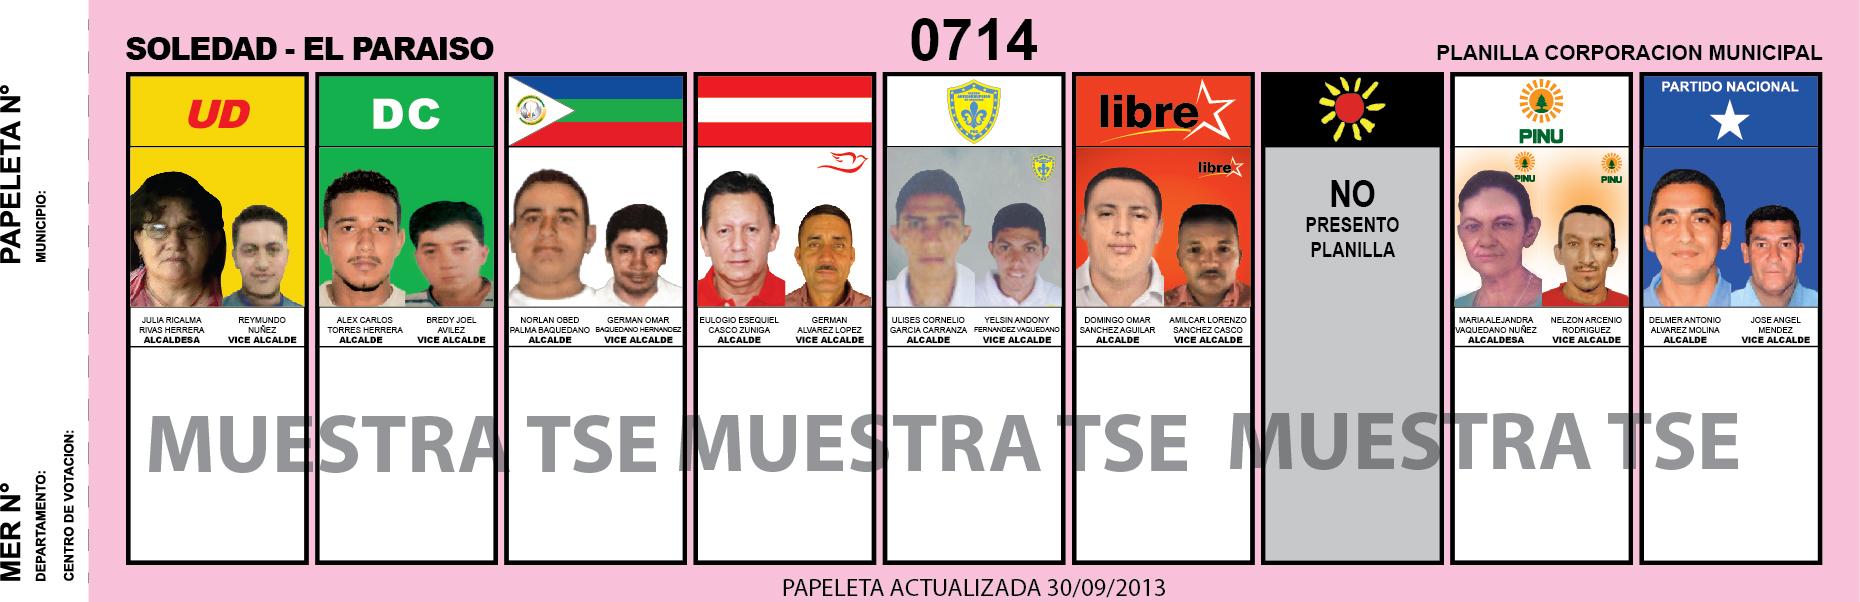 CANDIDATOS 2013 MUNICIPIO SOLEDAD - EL PARAISO - HONDURAS